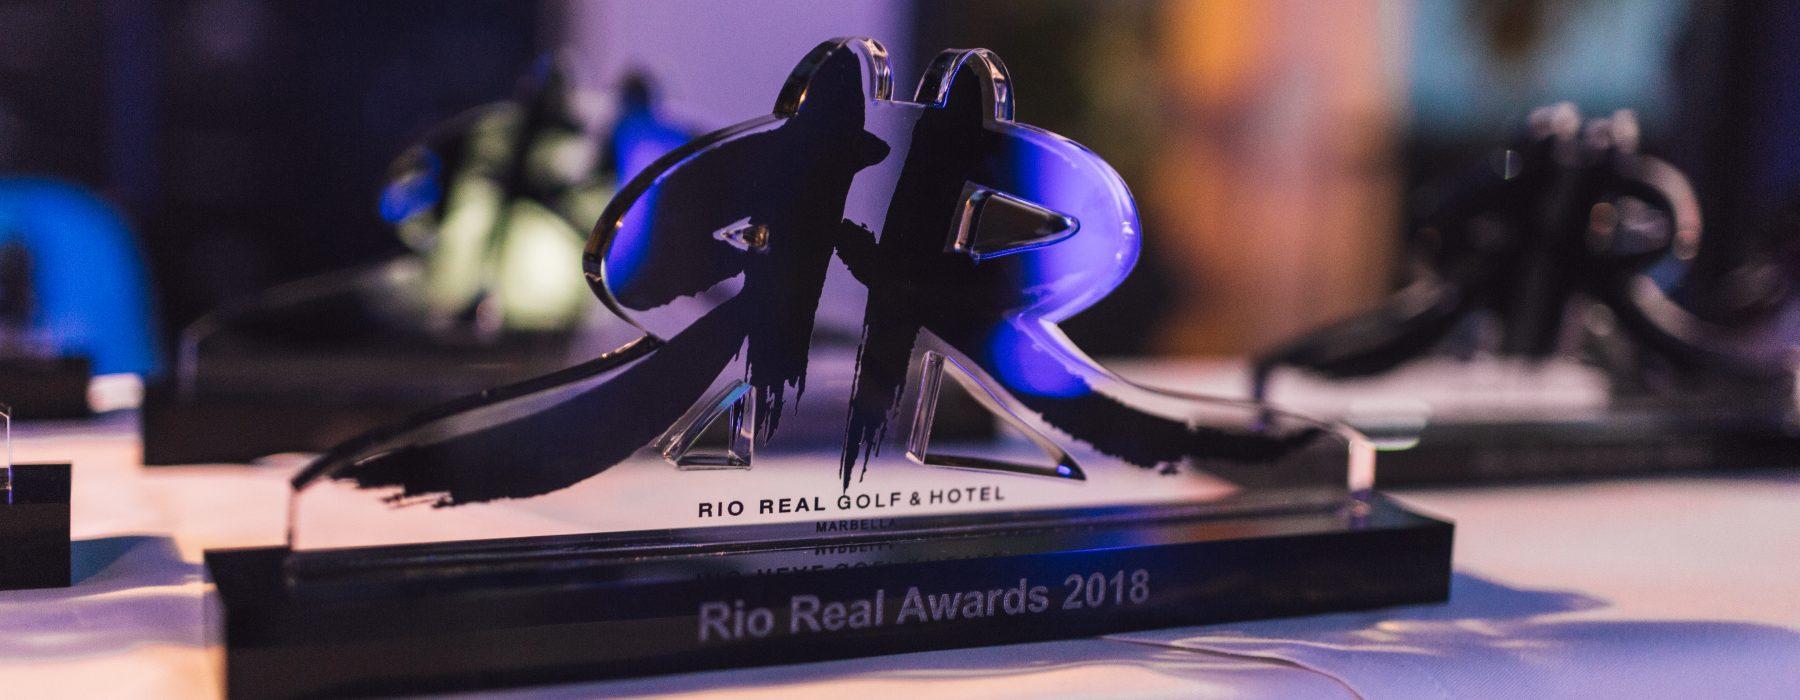 PREMIOS RIO REAL AWARDS, SEPTIEMBRE 2018